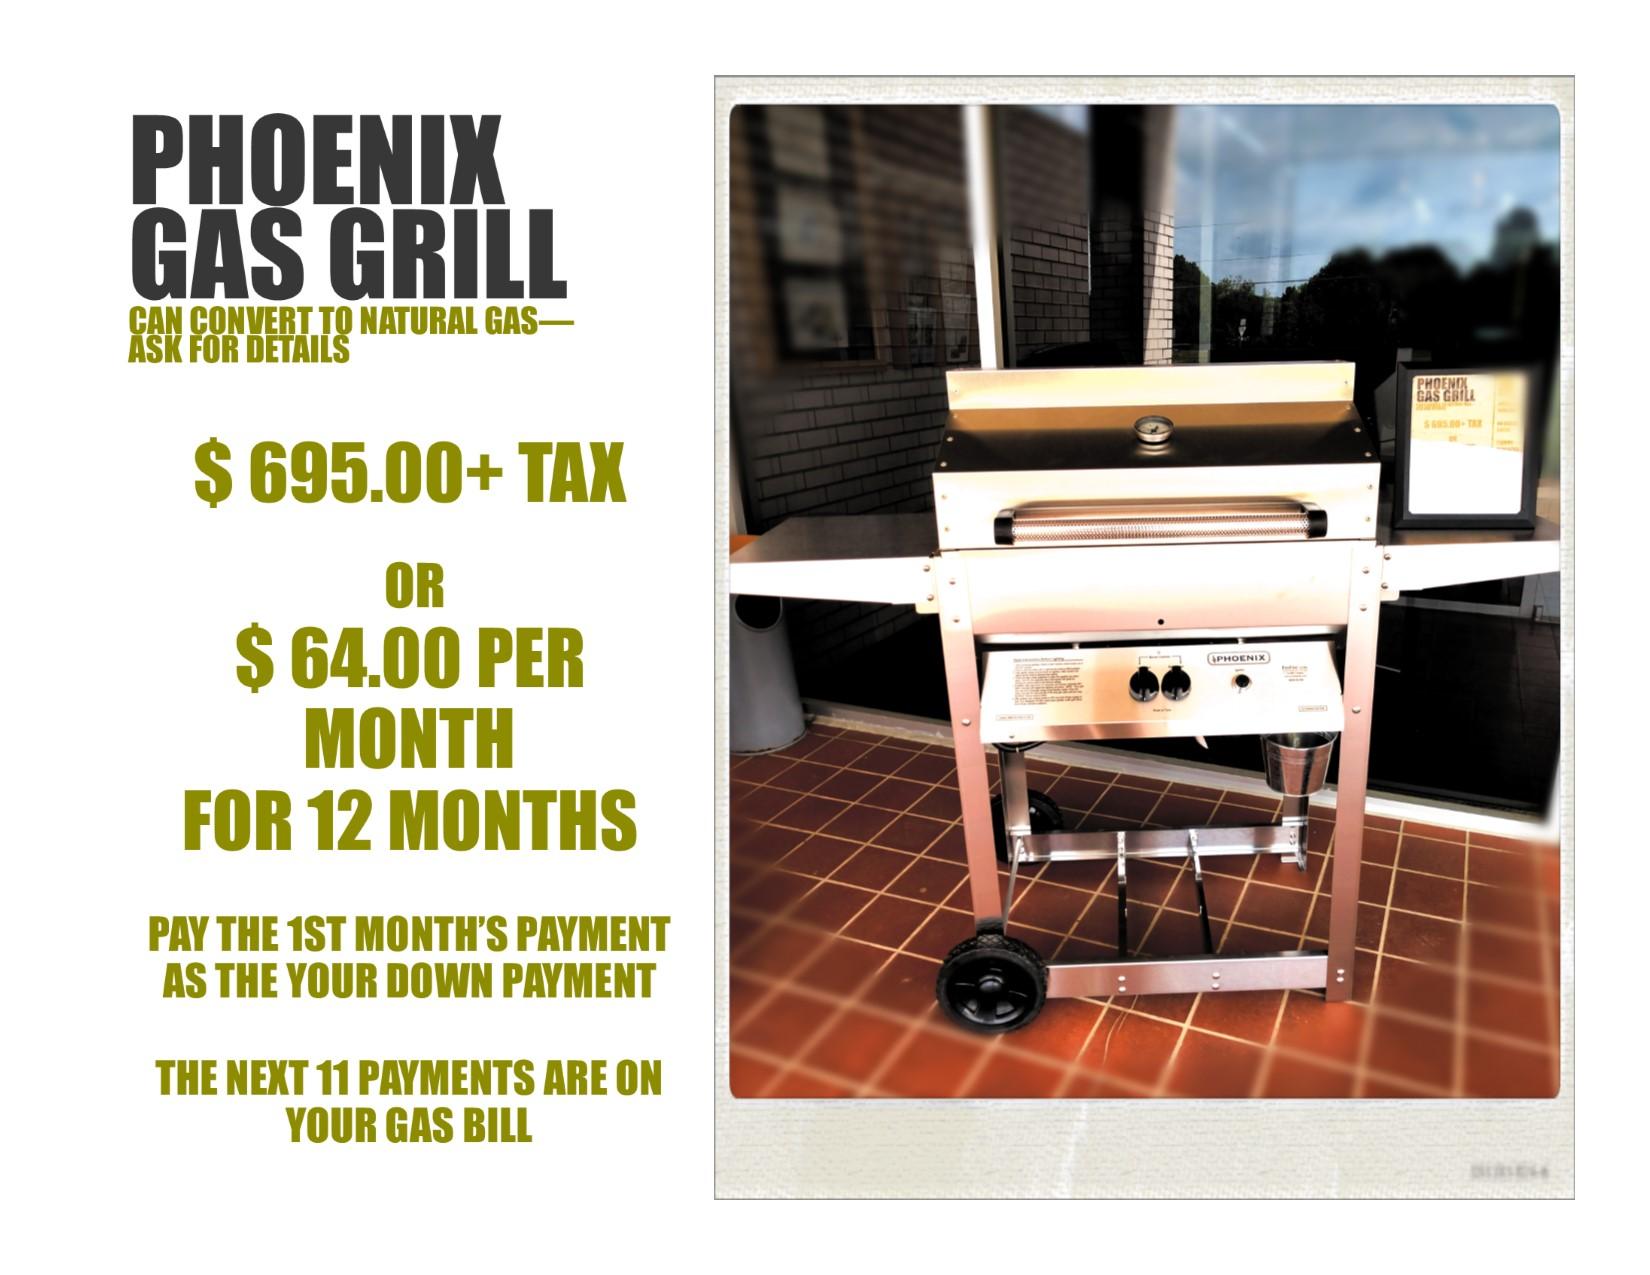 Phoenix Gas Grill